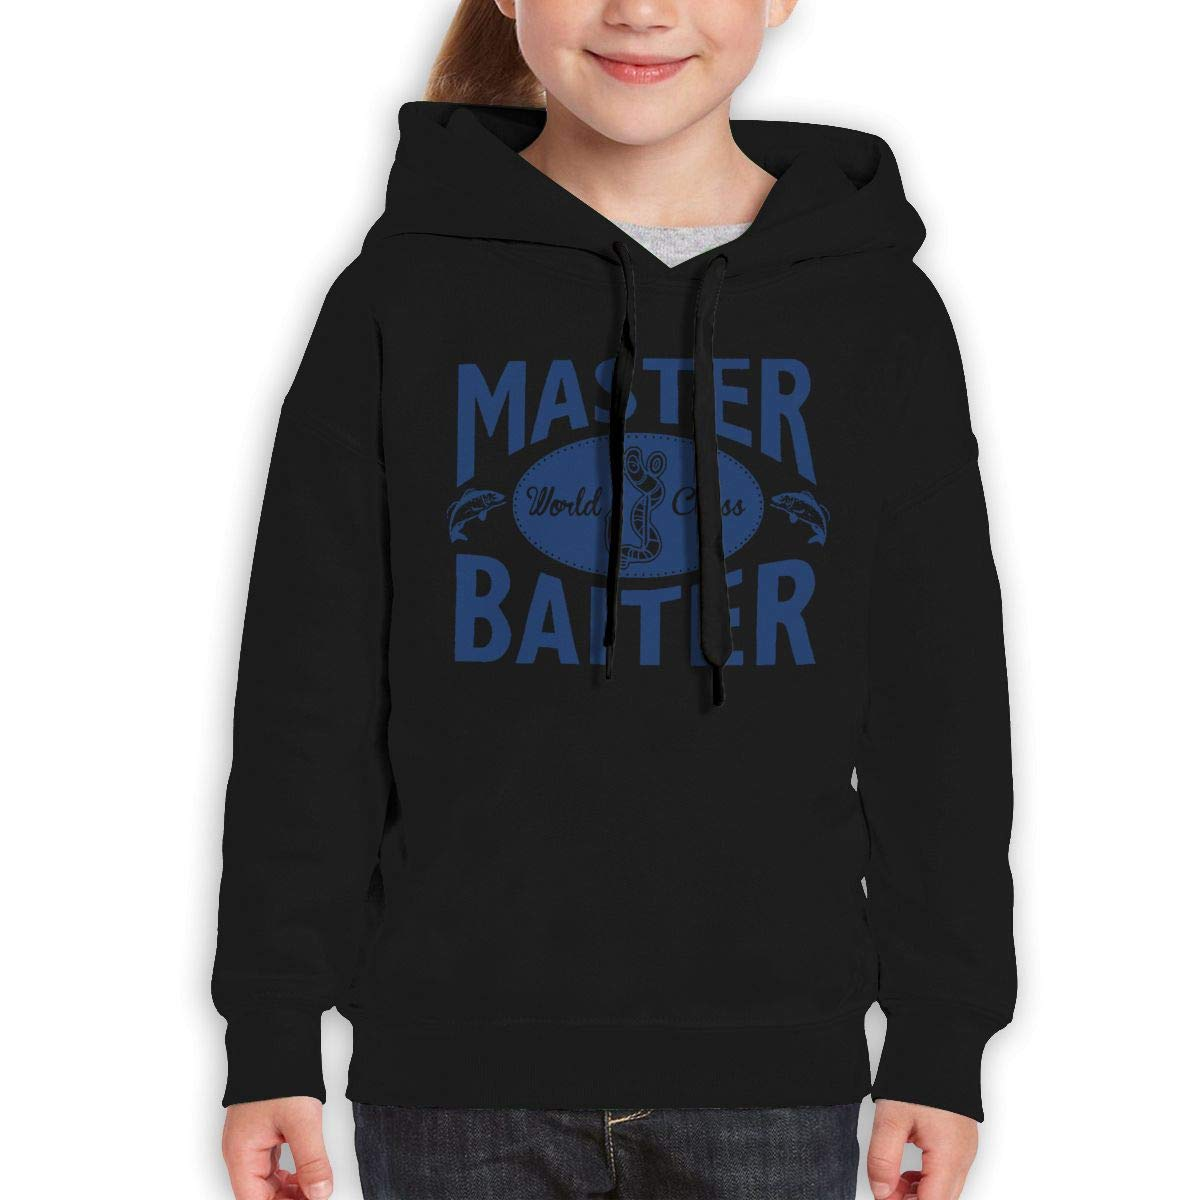 Boys Girls Master World Class Baiter Teen Youth Hoodies Black